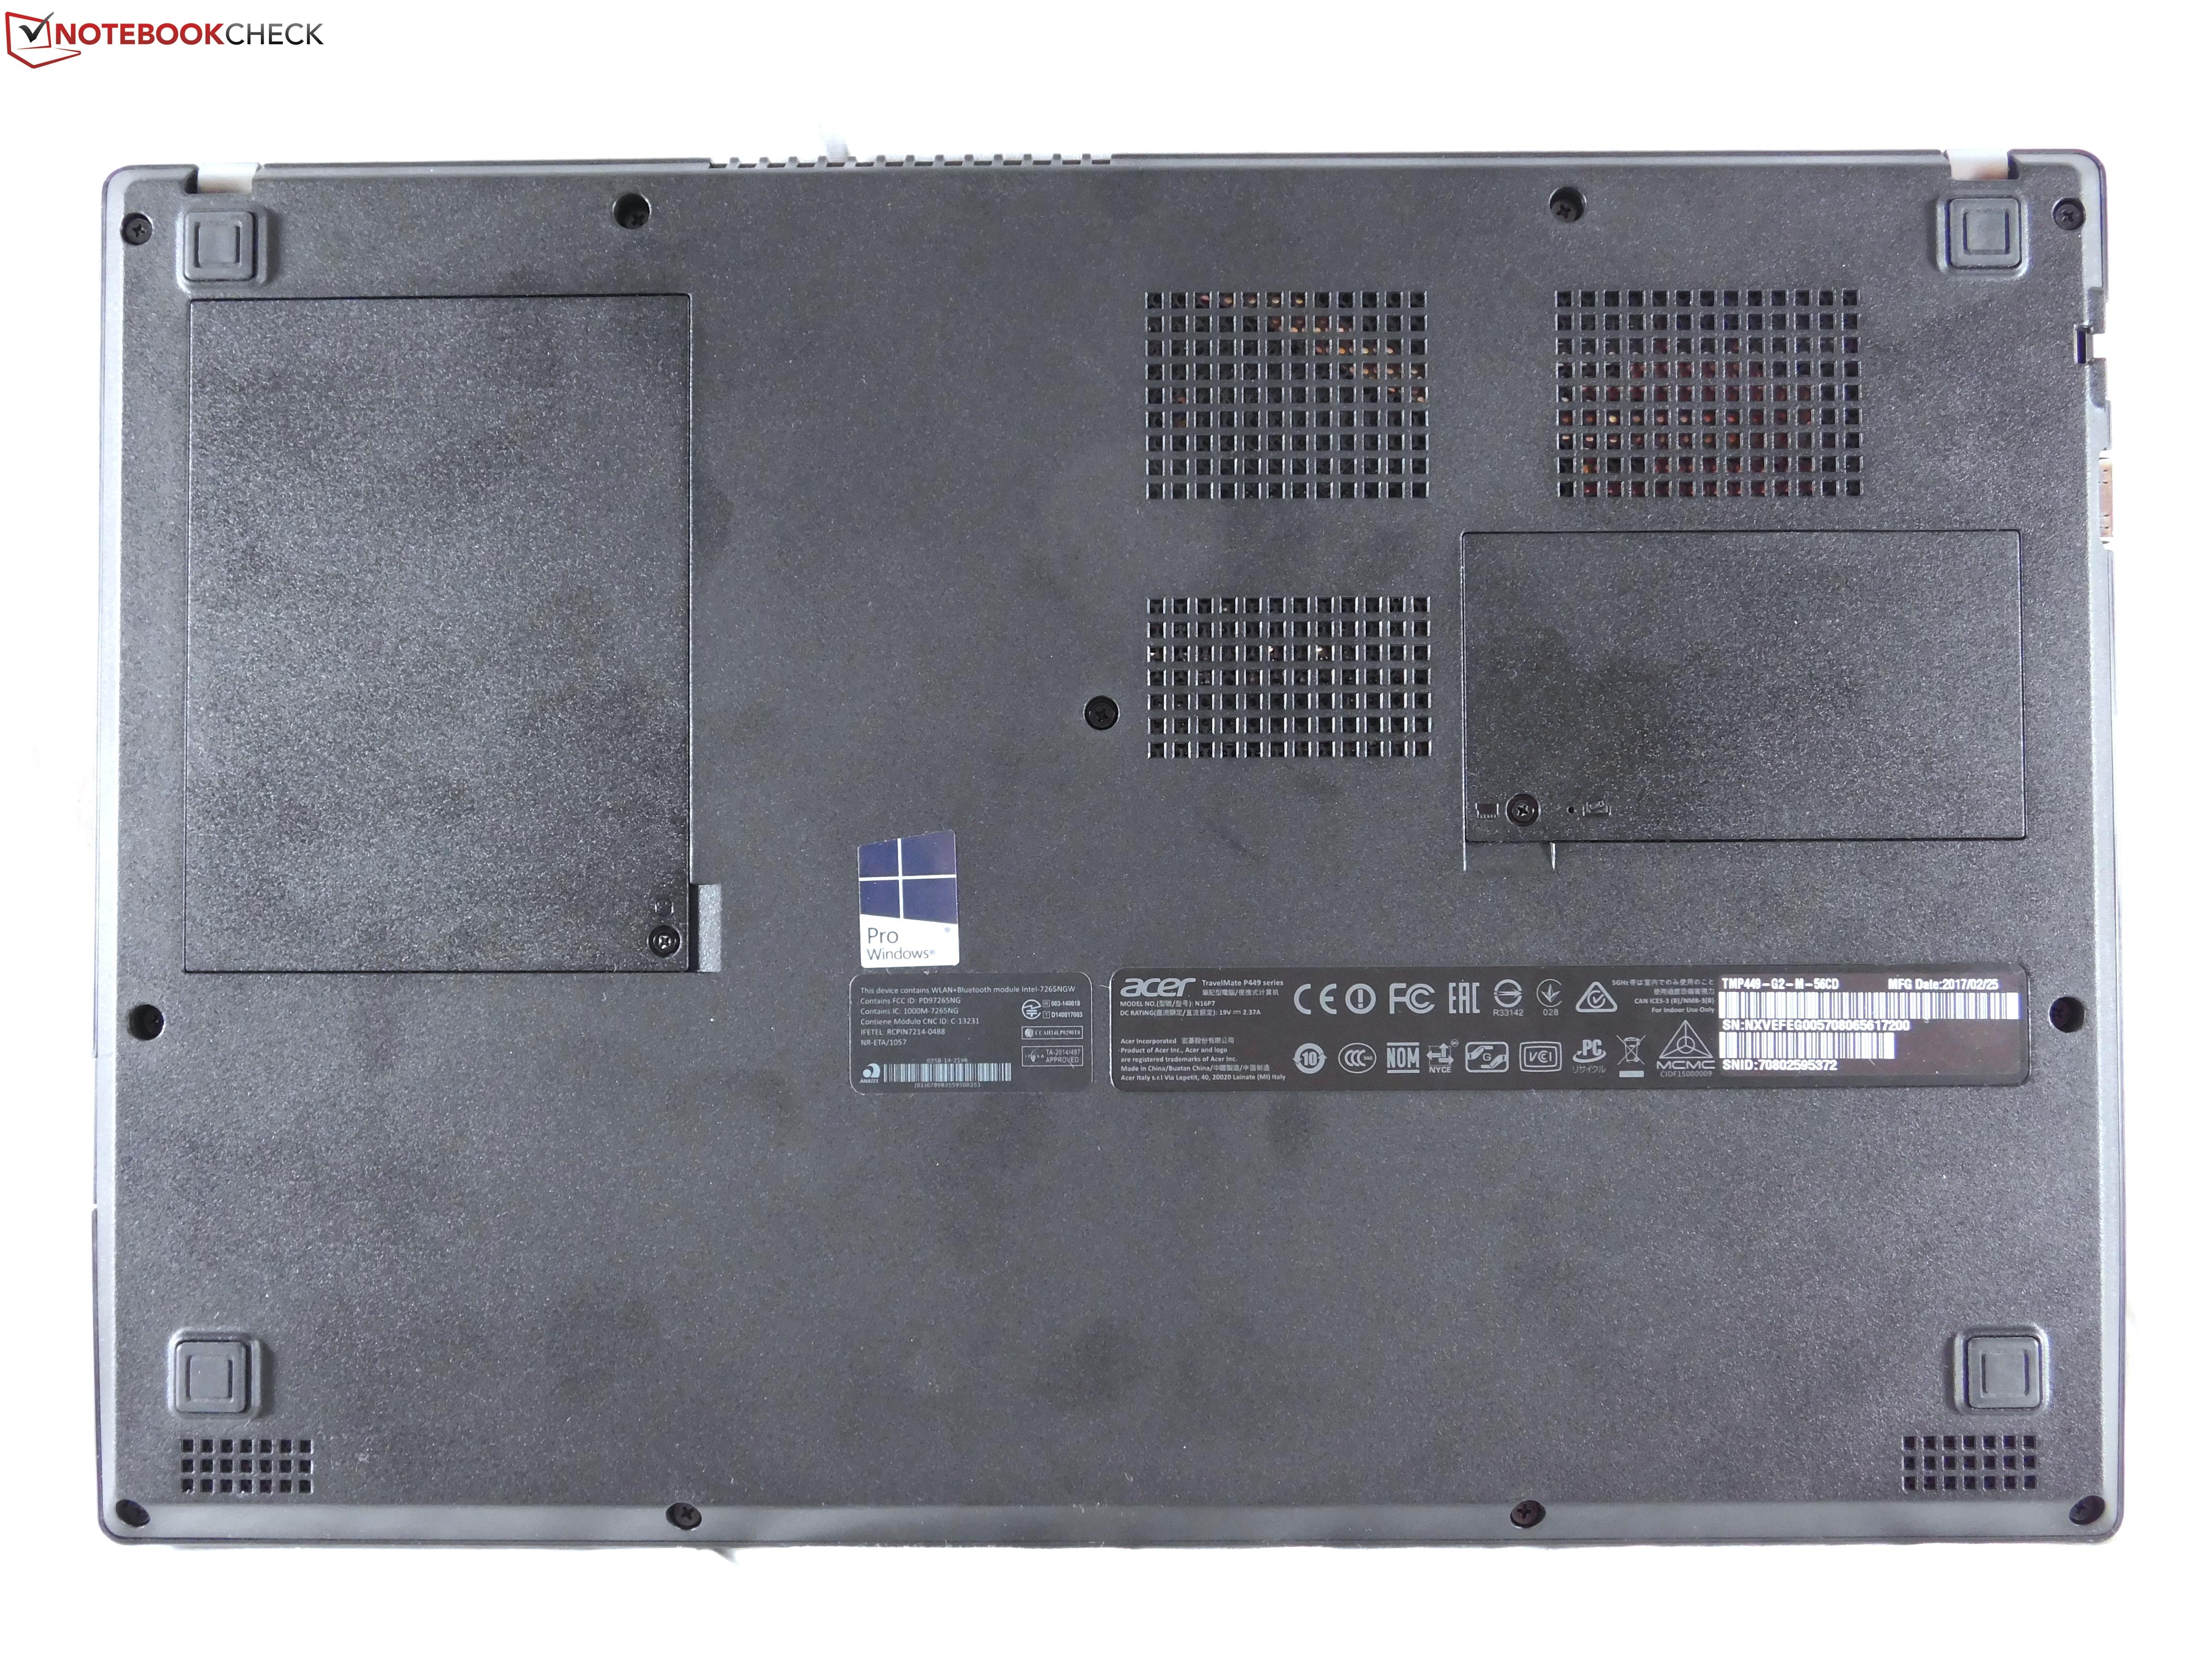 ACER ASPIRE 1430Z QUALCOMM 3G MODULE DRIVER DOWNLOAD (2019)